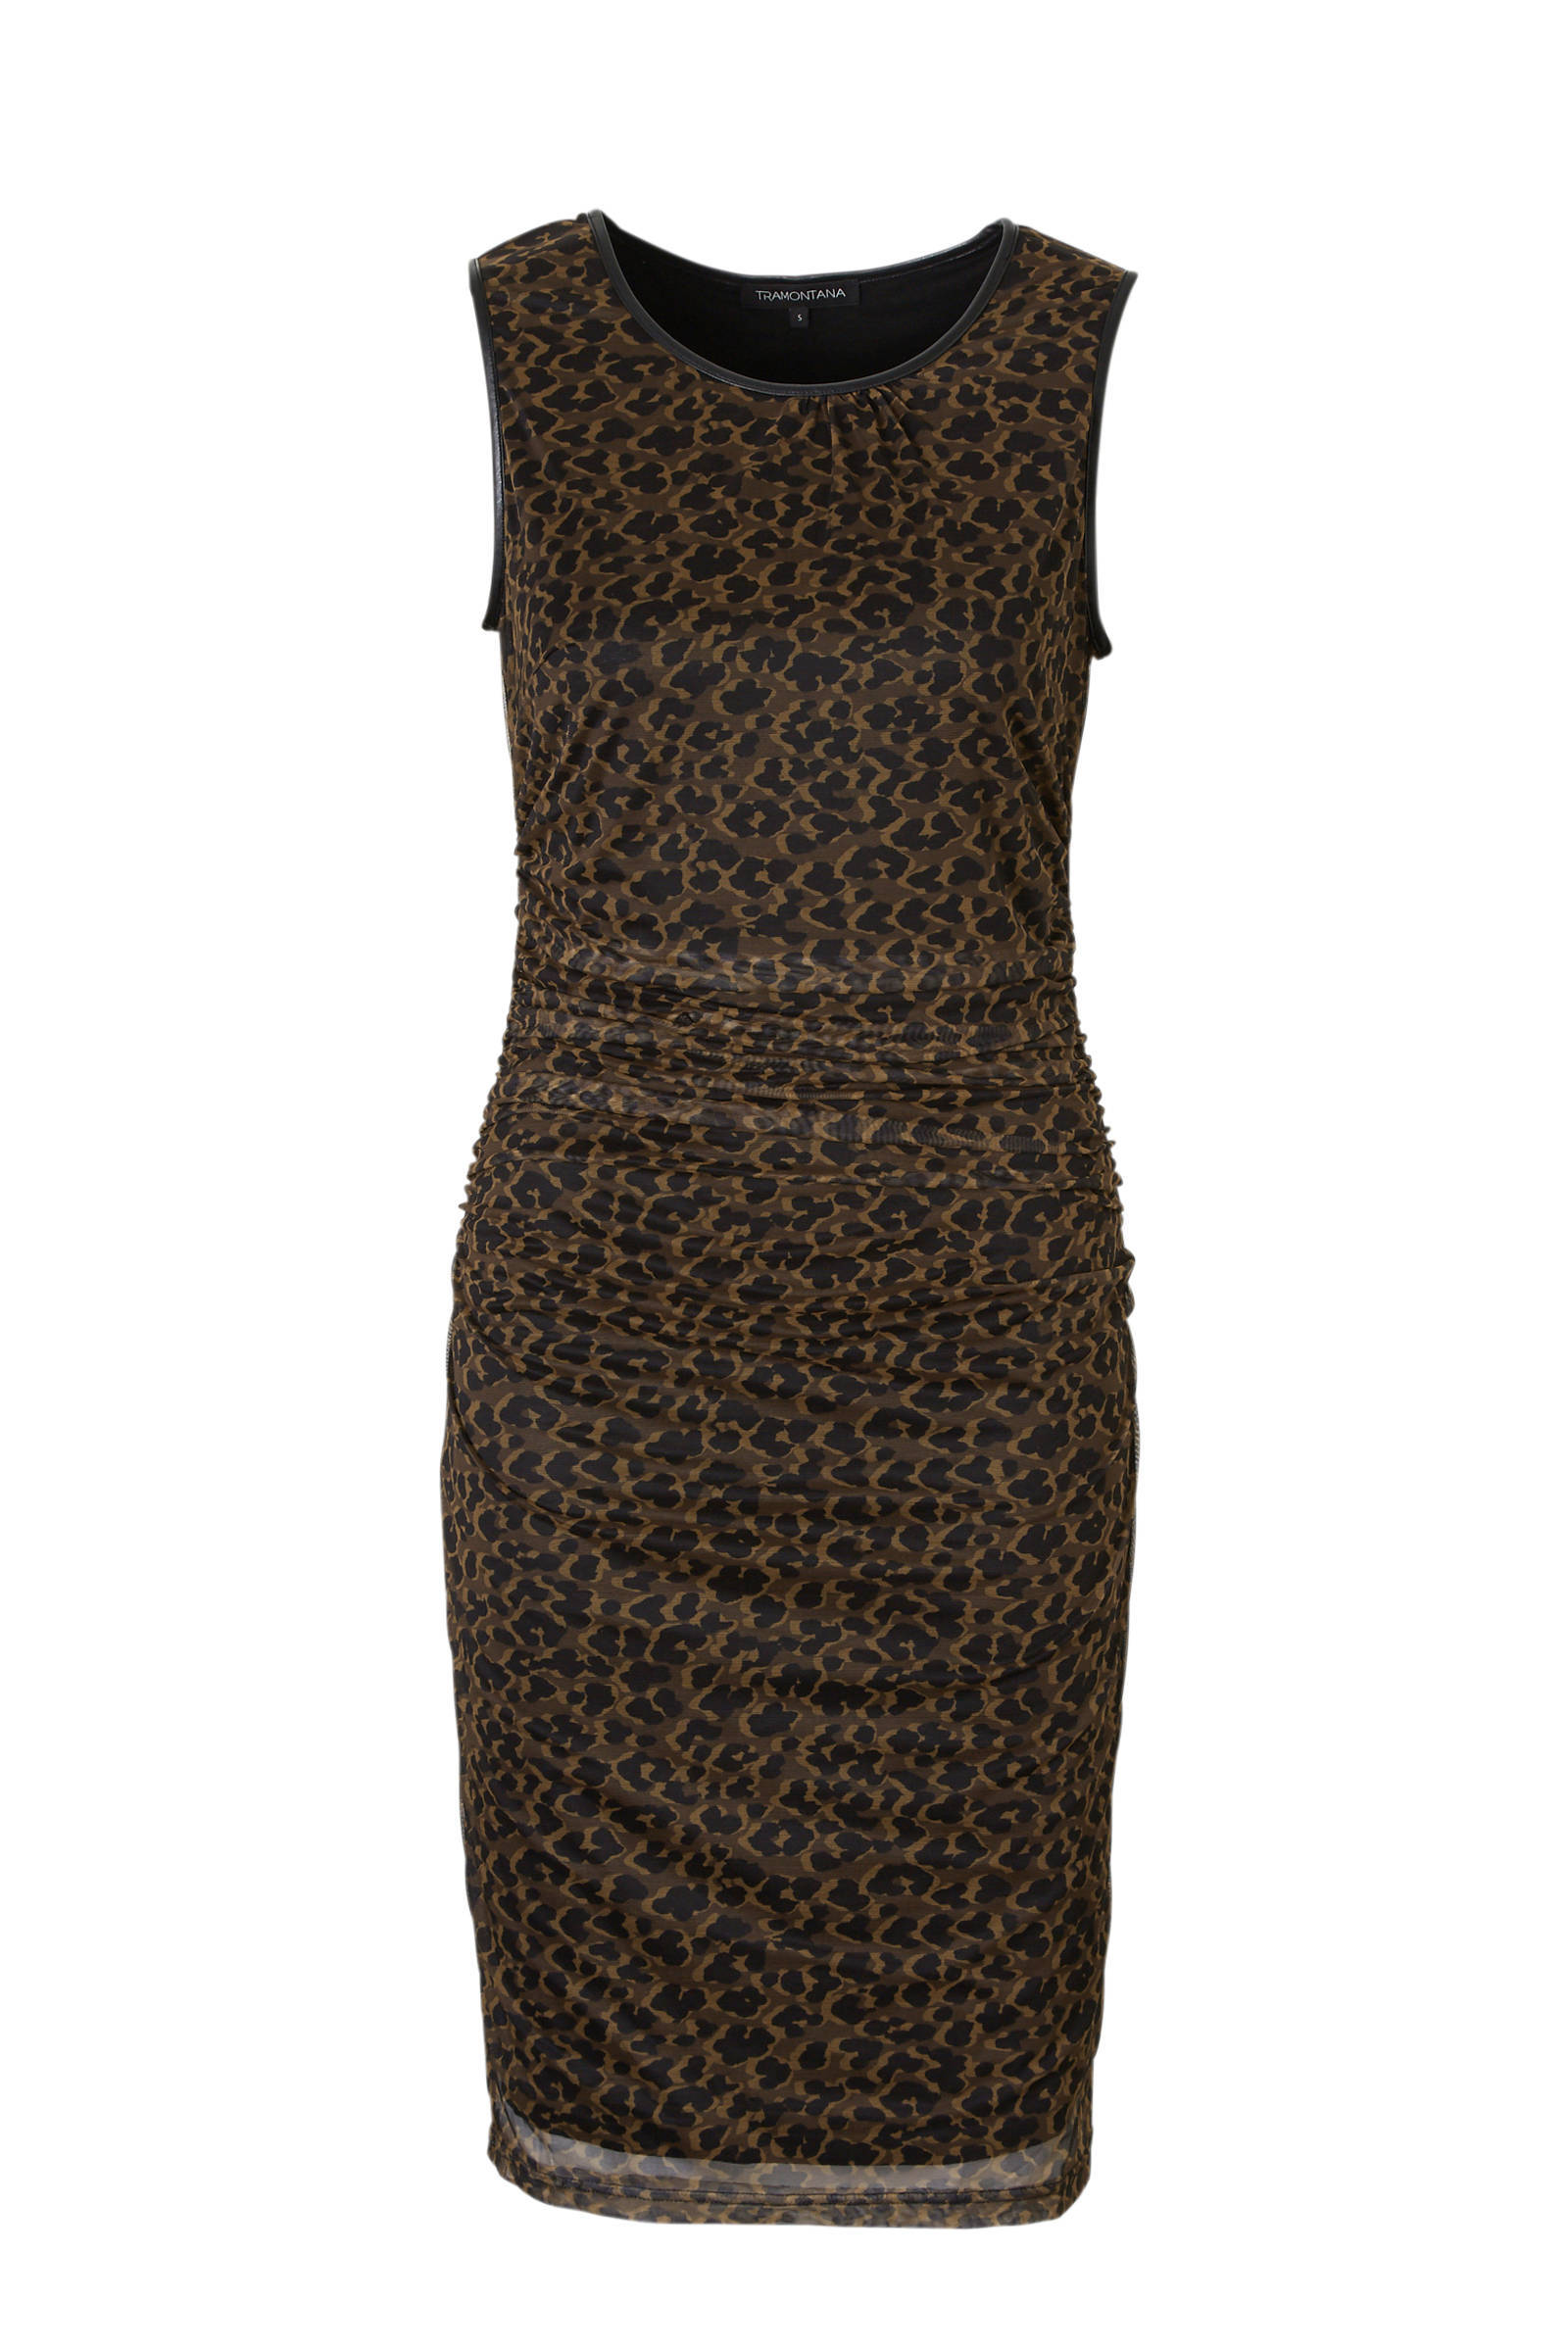 f5257d4c560b71 tramontana-jurk-in-een-panterprint-zwart-8717754740244.jpg